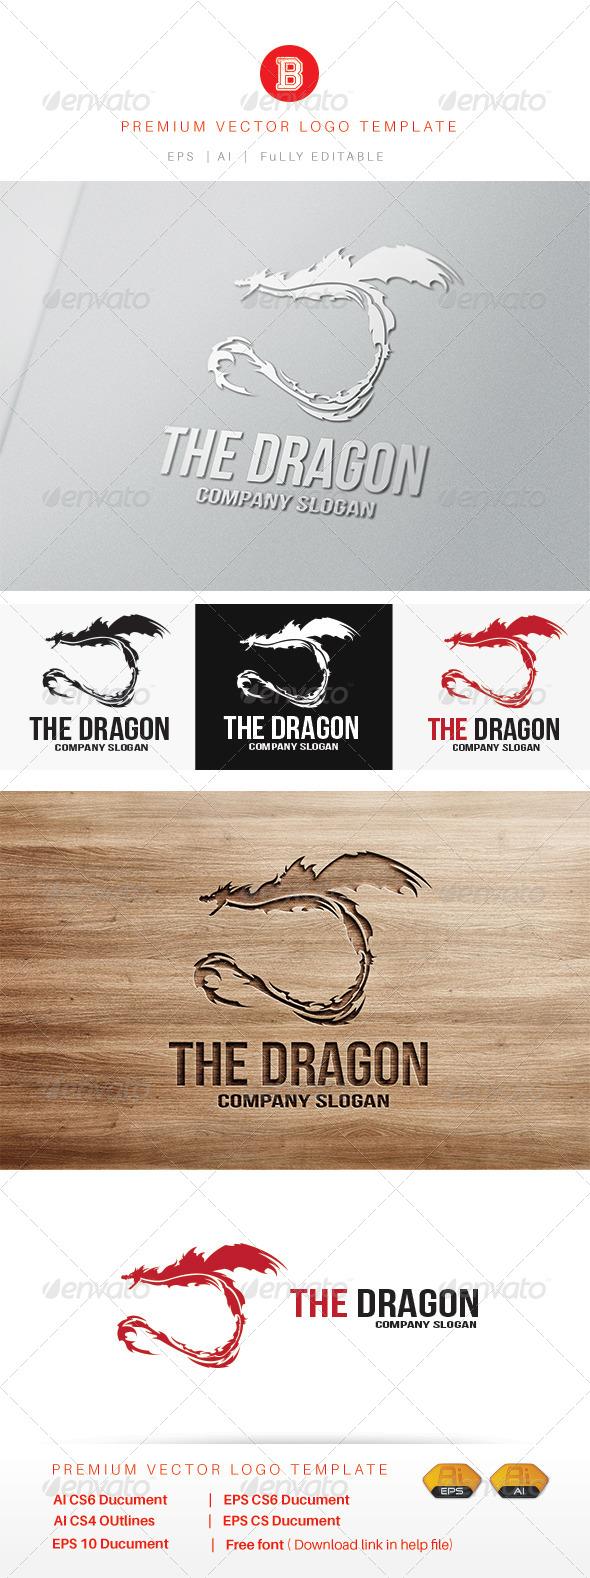 GraphicRiver The Dragon V2 7988535